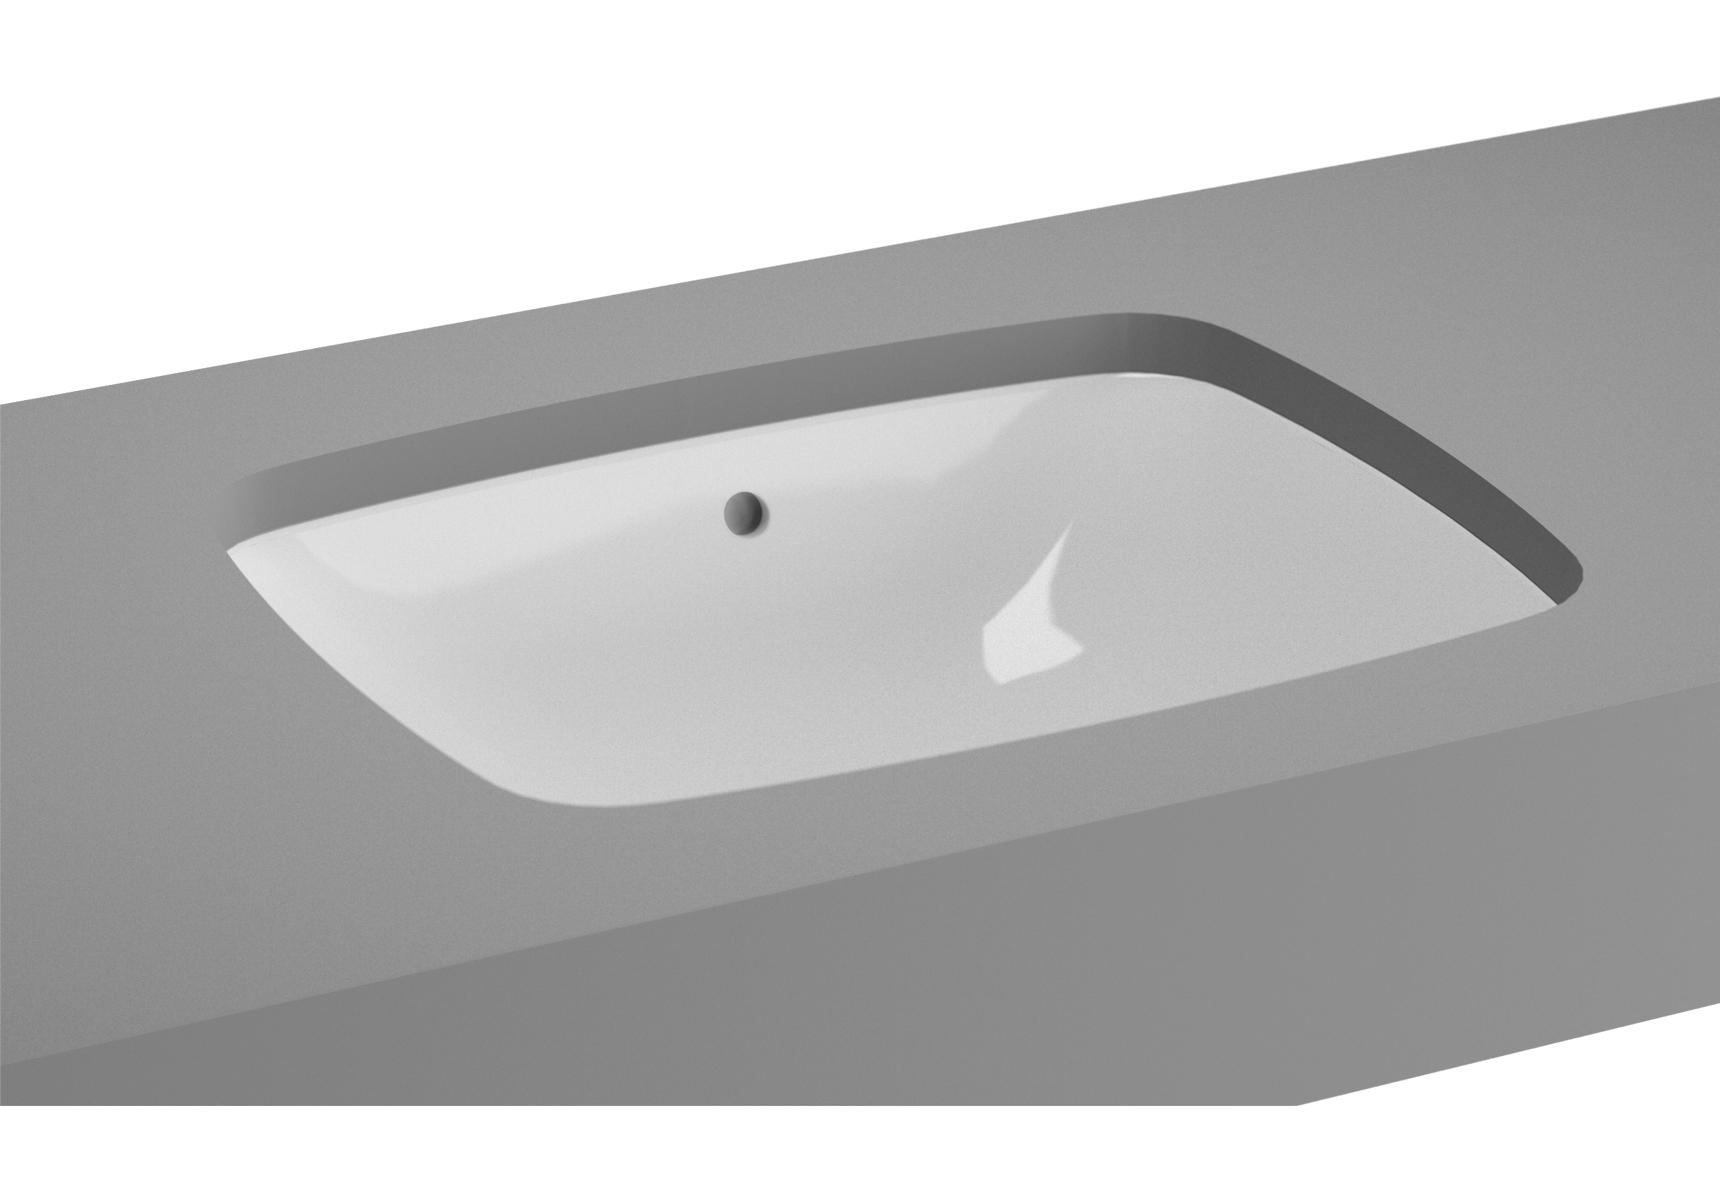 Metropole Unterbauwaschtisch, rechteckig, 50 cm